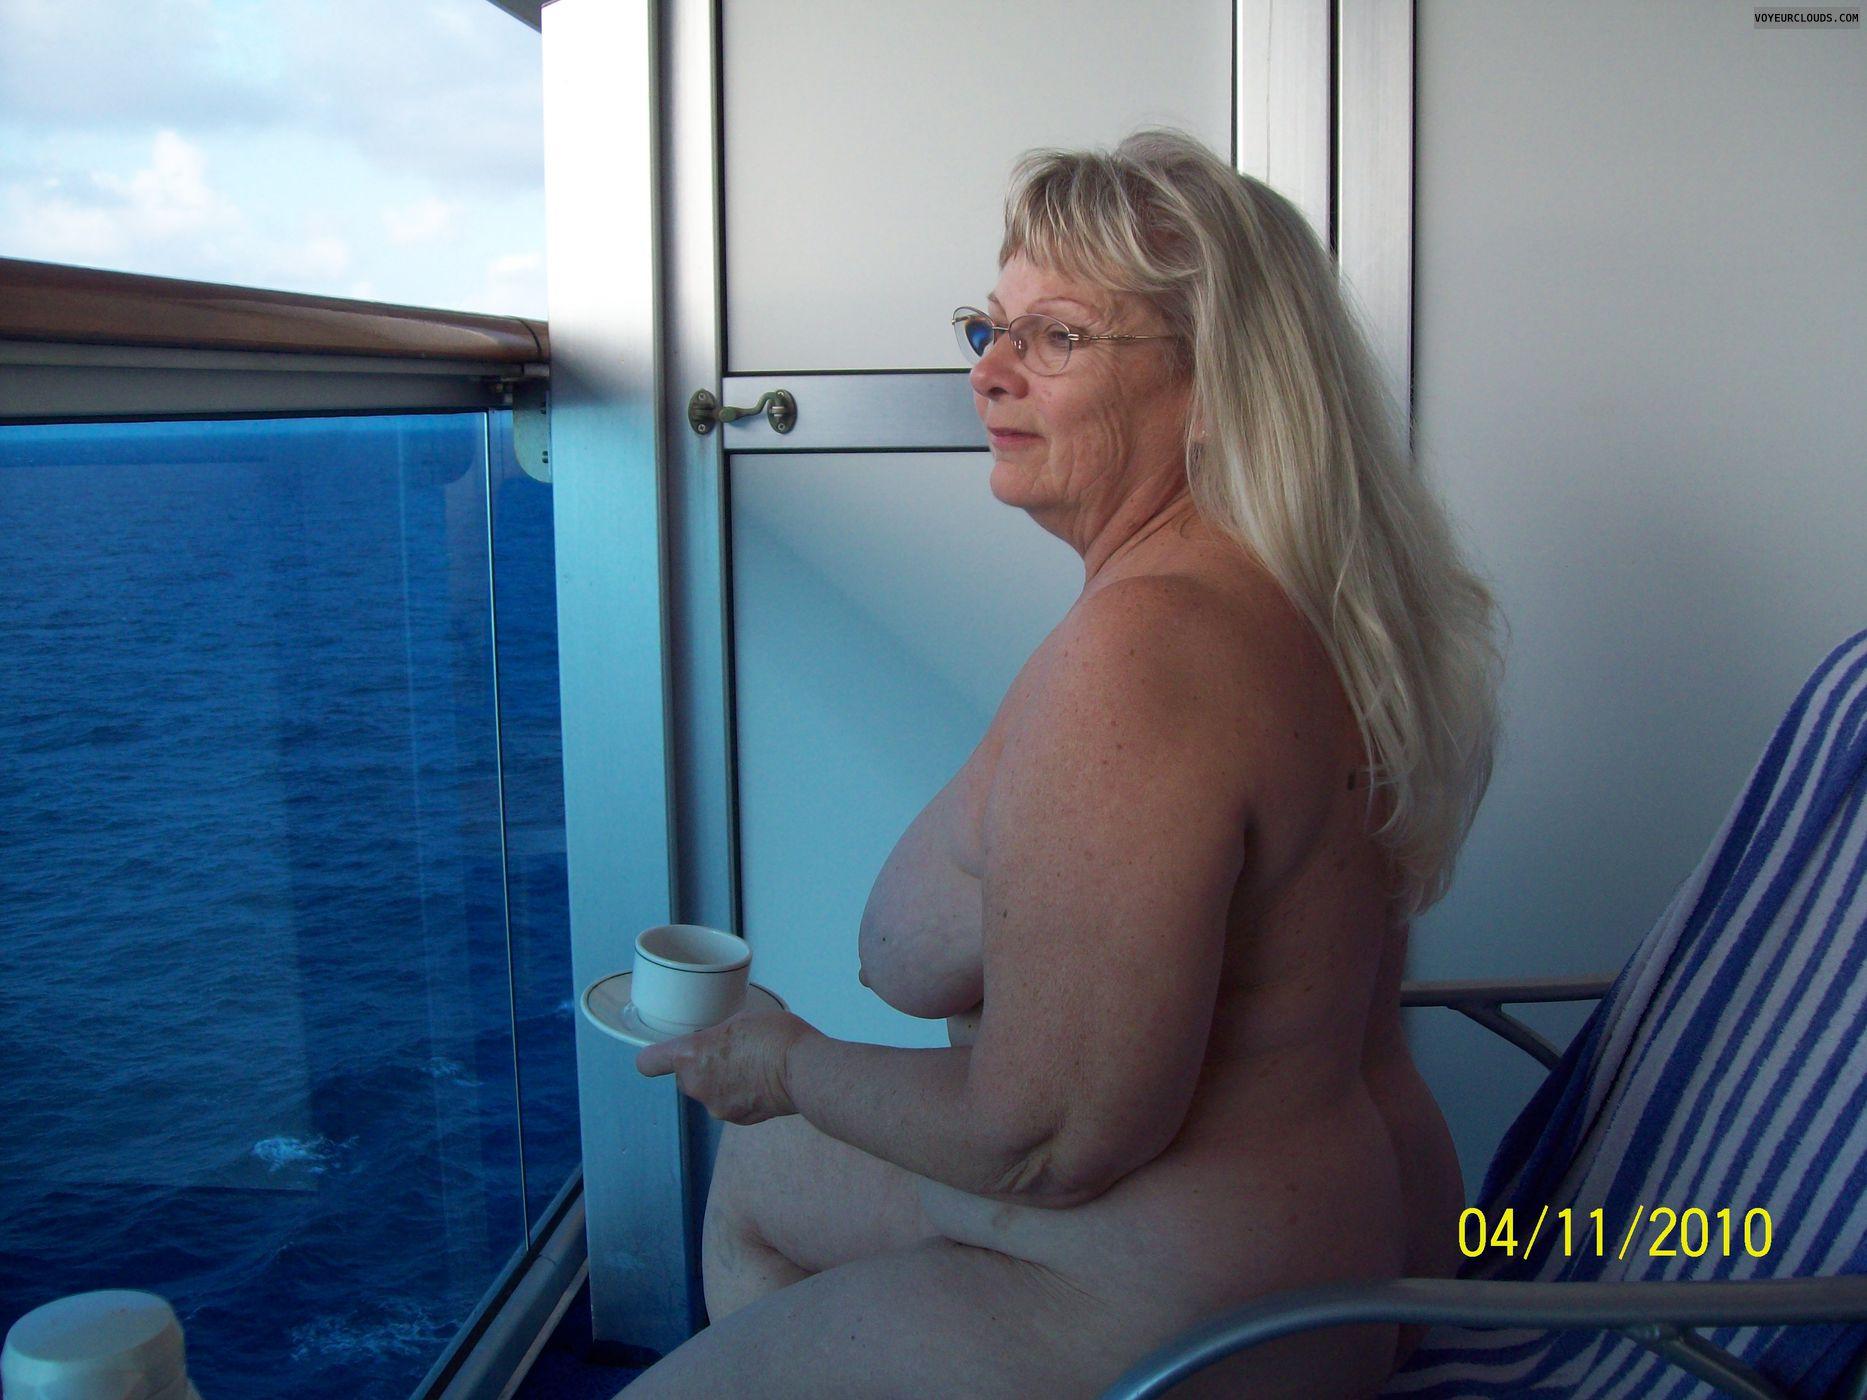 Cruise ship nudity pics